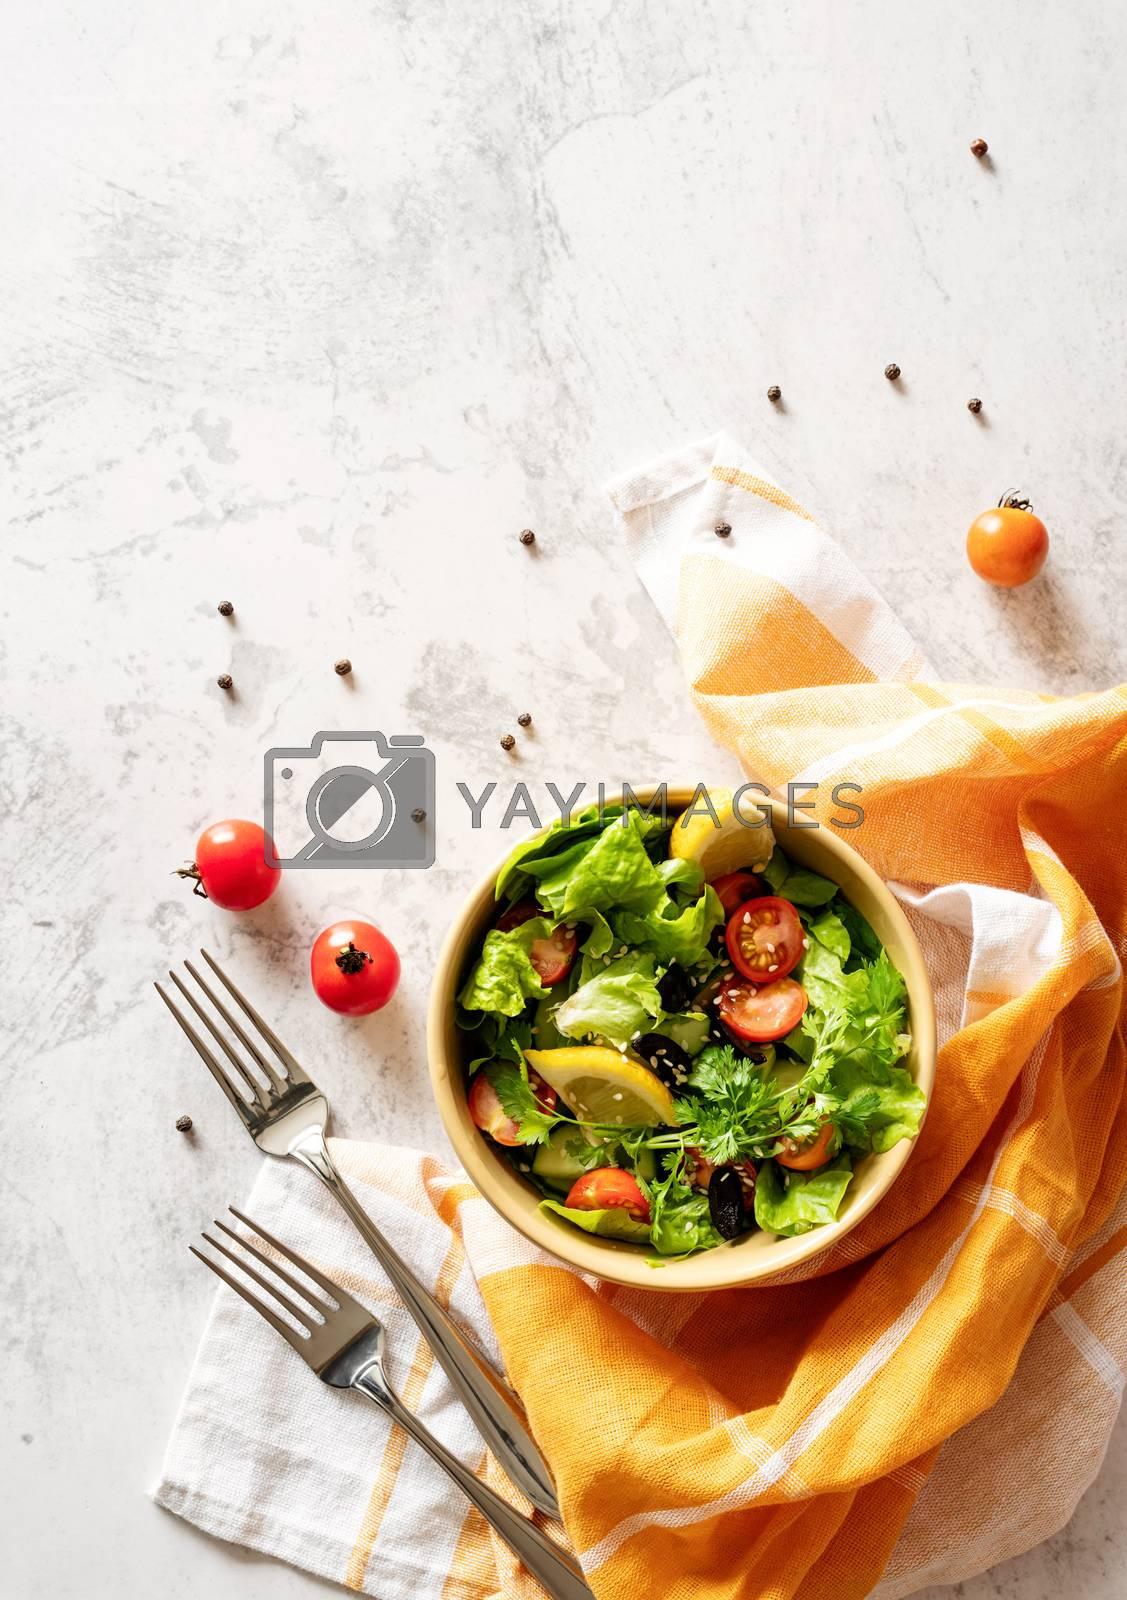 Royalty free image of bowl of vegetable mixed salad top view flat lay by Desperada